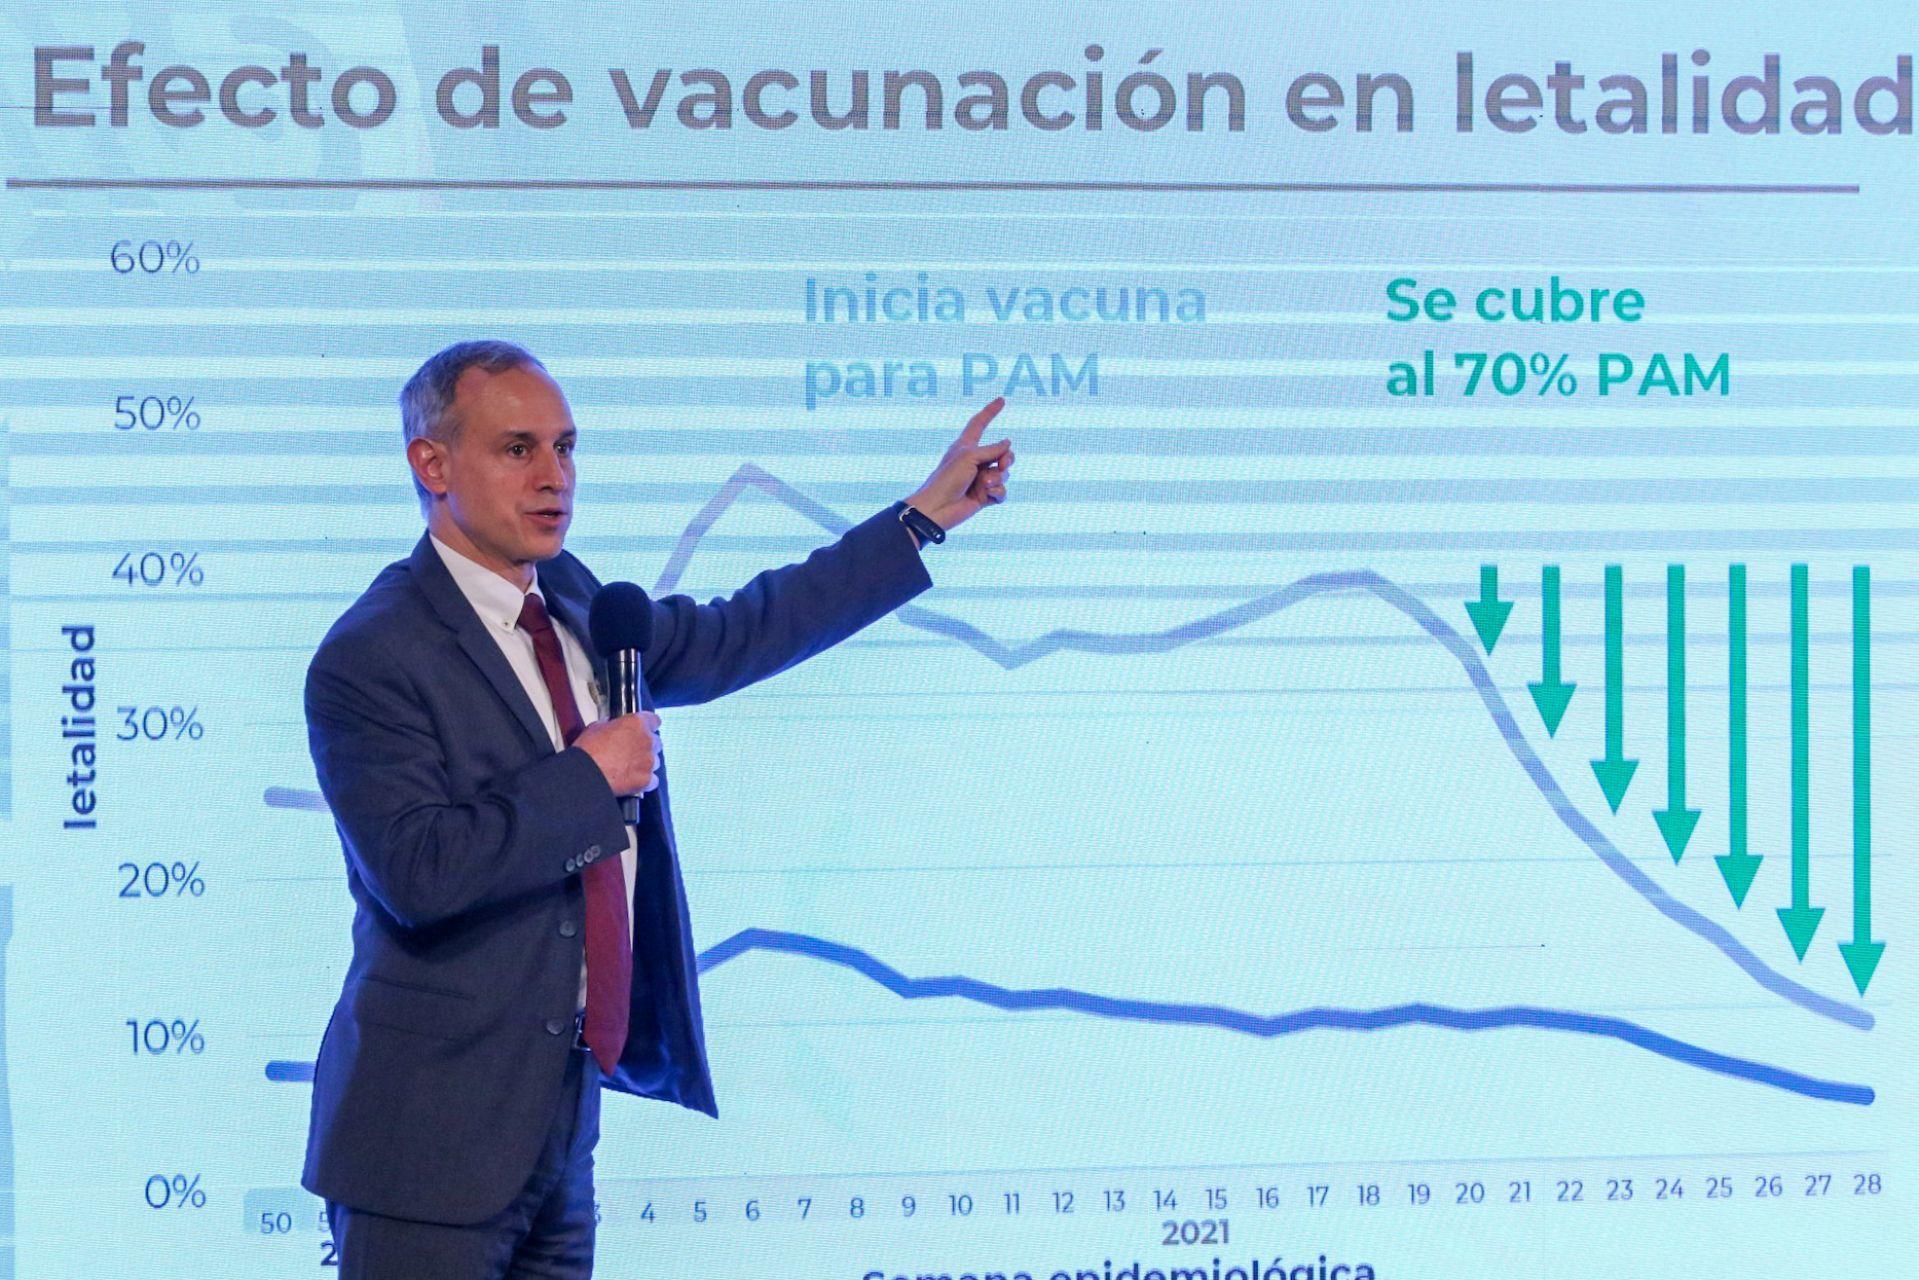 Reconvierten hospitales por alza de casos COVID-19 en México